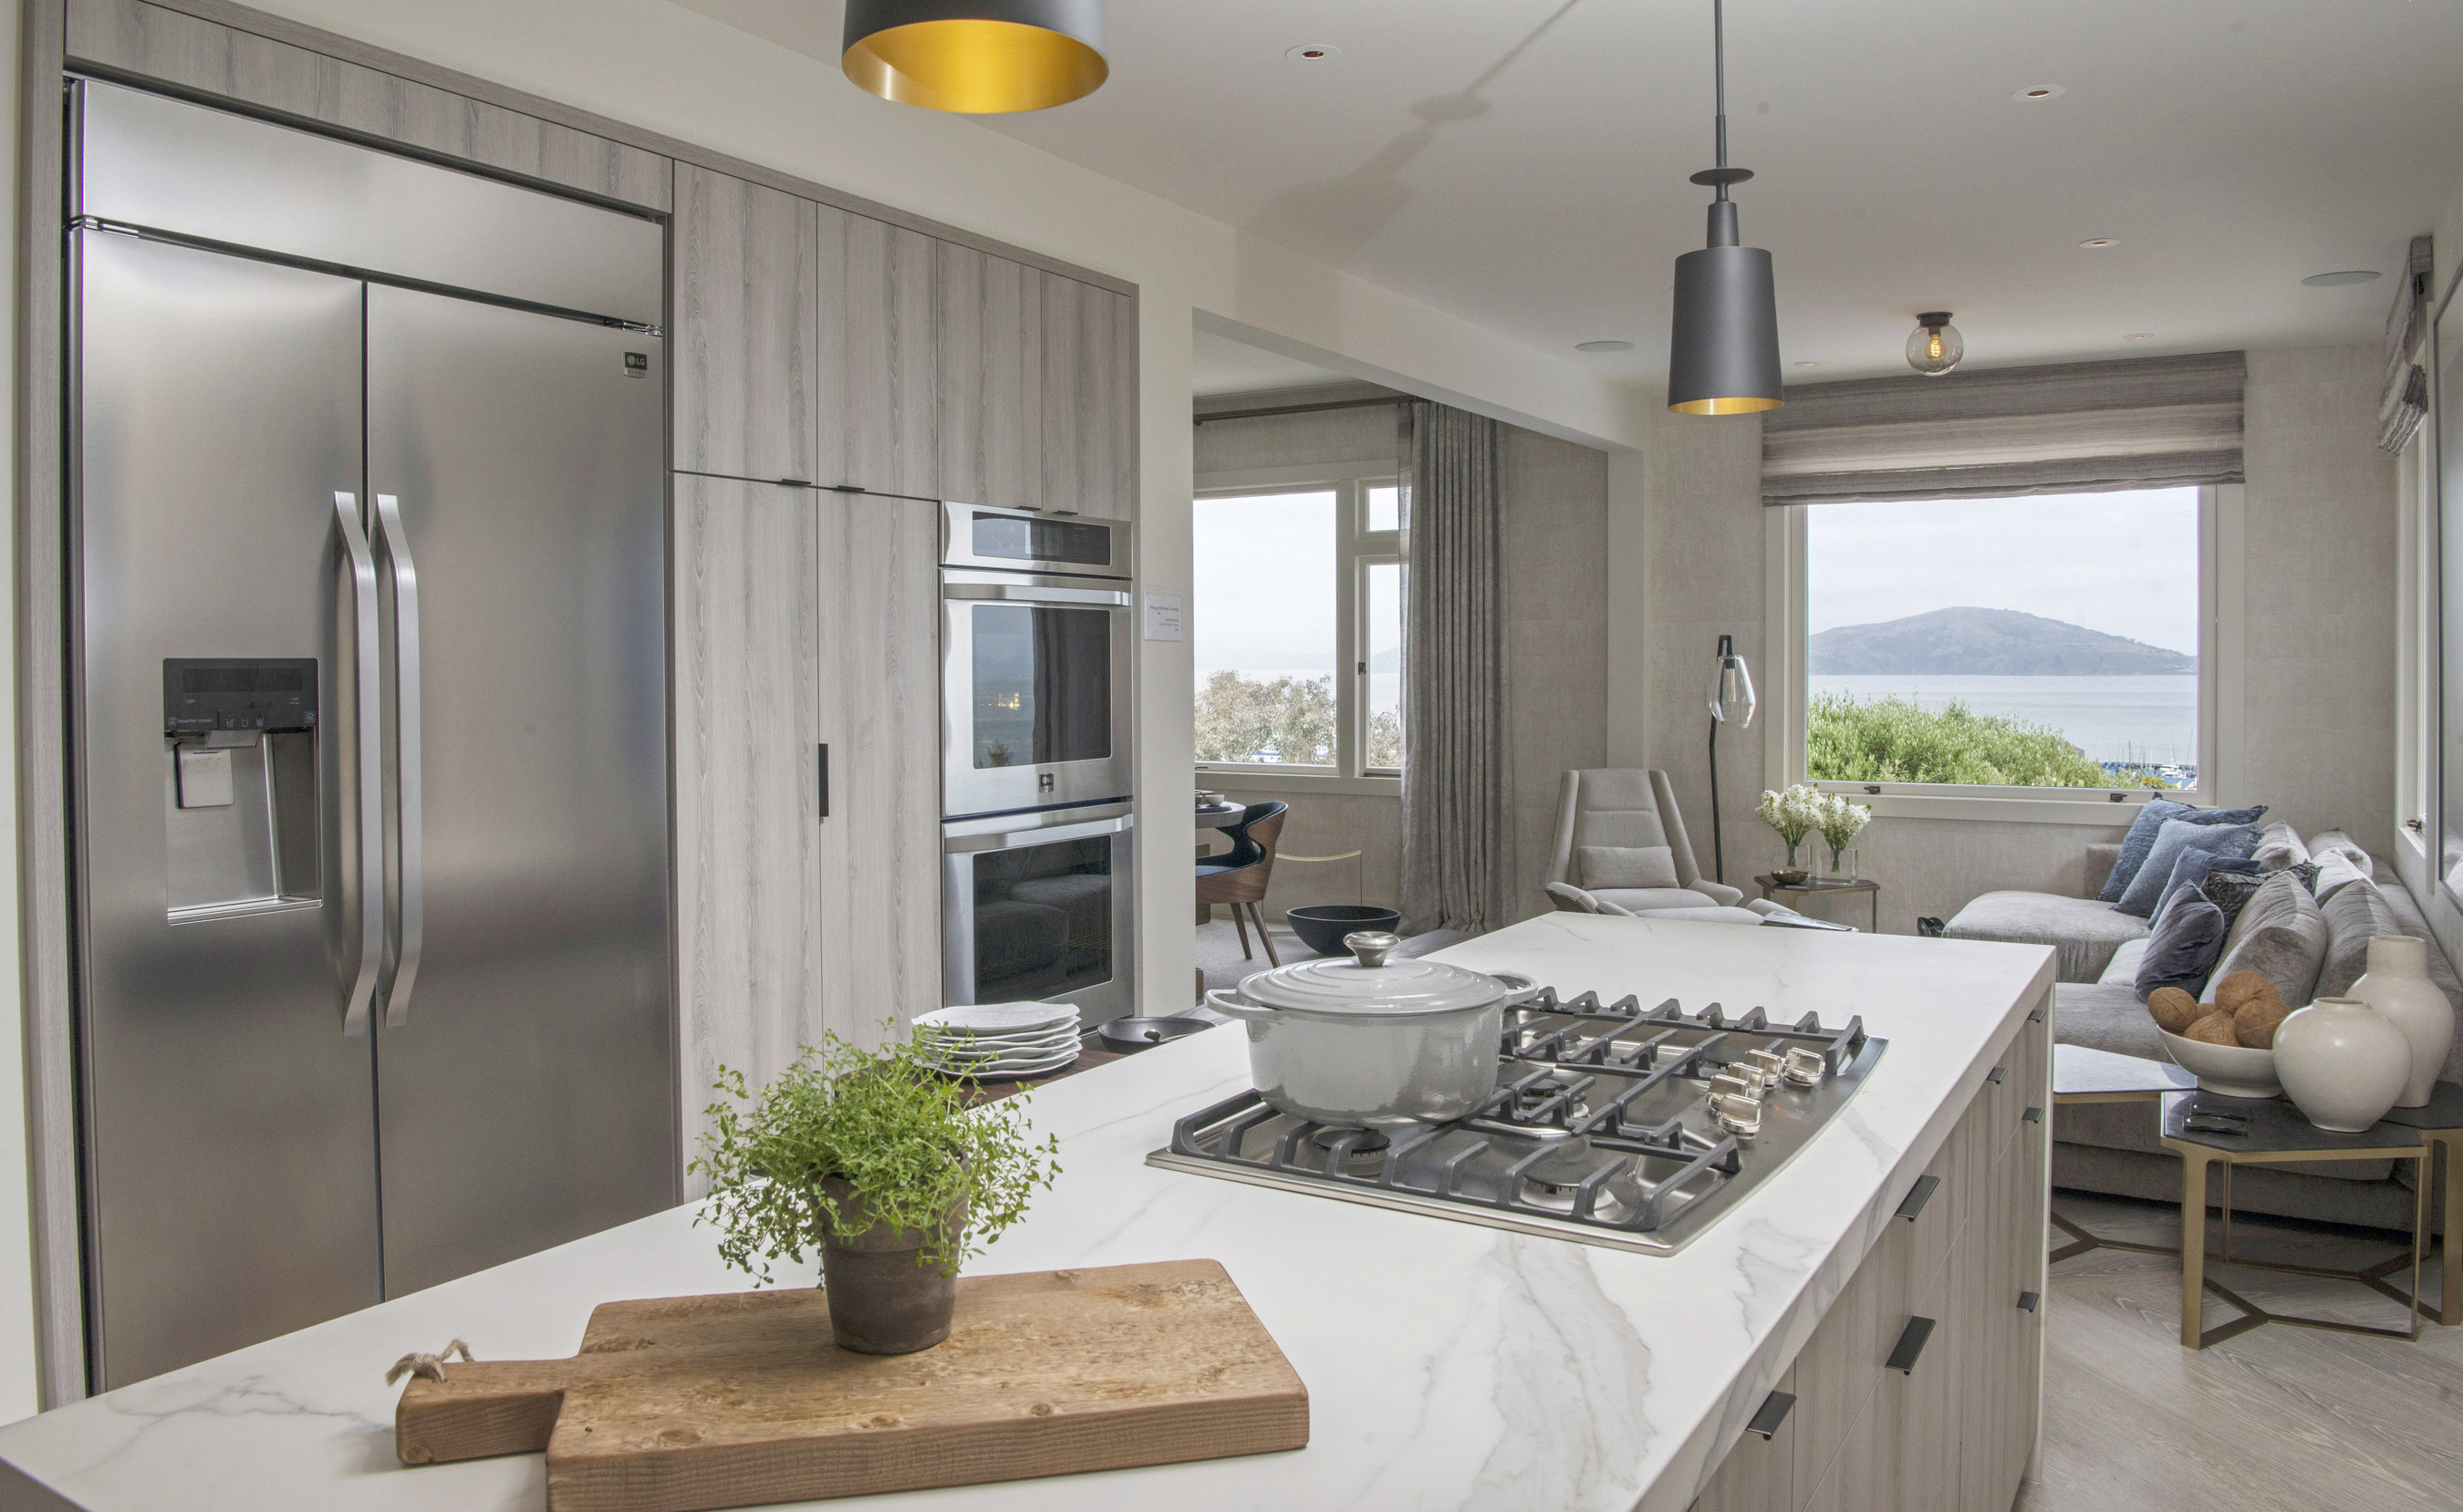 LG Studio Named Exclusive Home Appliance Partner Of 2016 San